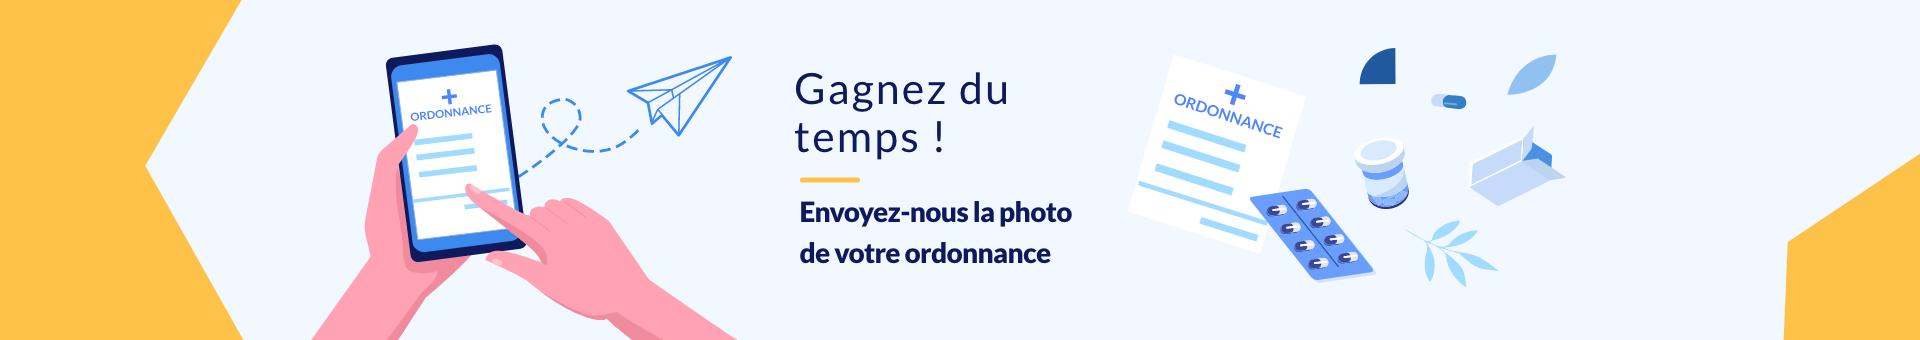 Click&Collect  ordonnance pharmacie Perrache Carnot Lyon 2